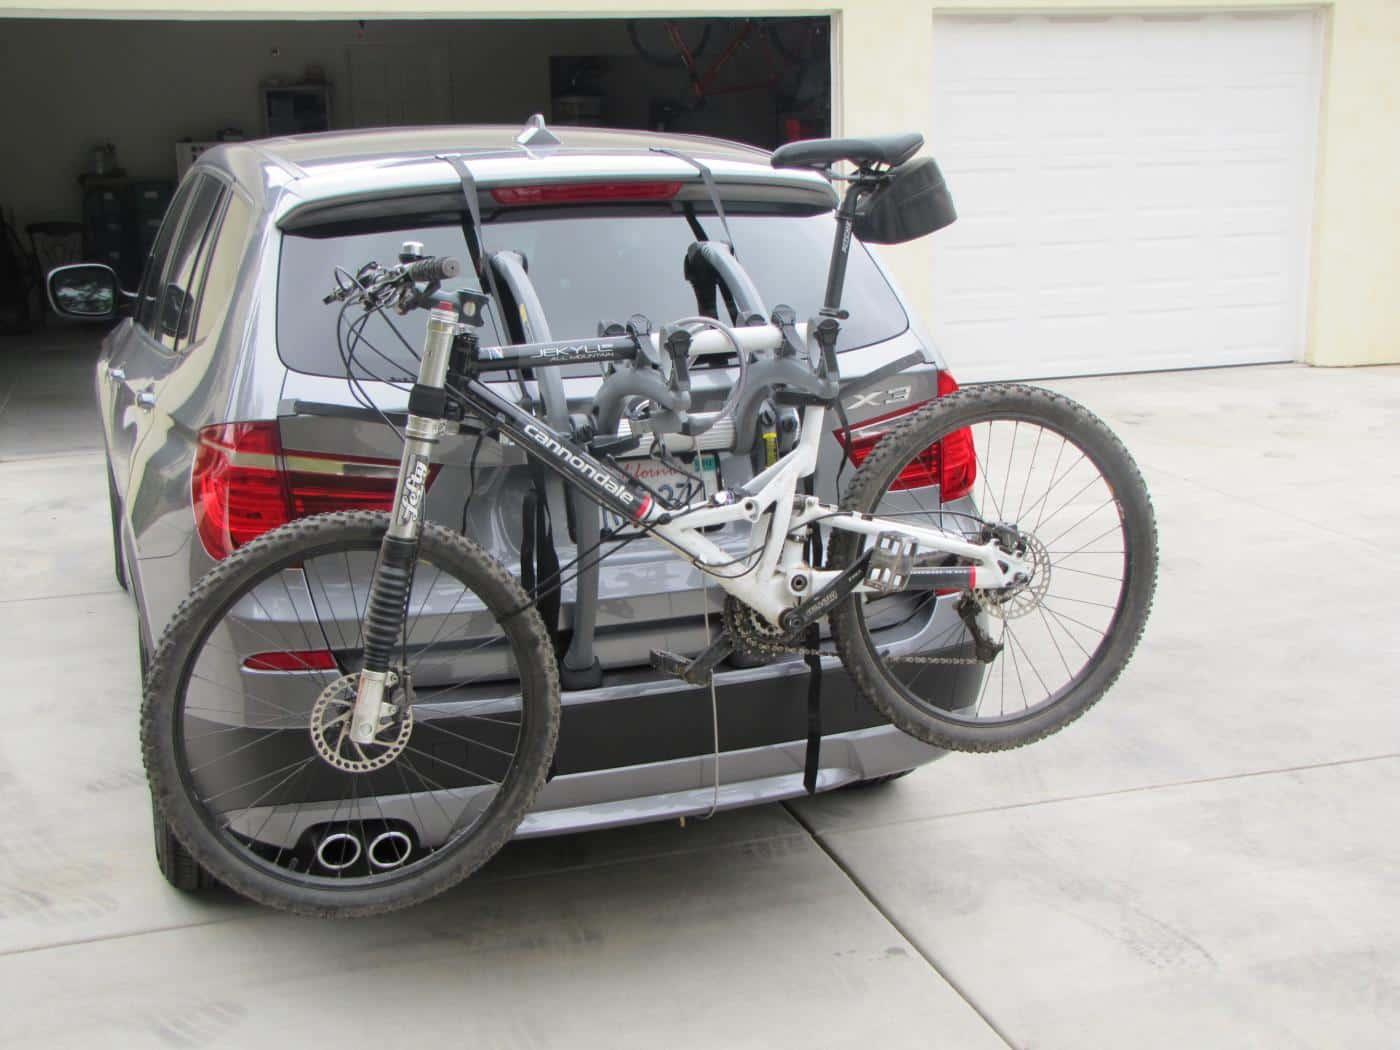 Nissan Juke Bike Rack Modern Arc Based Design